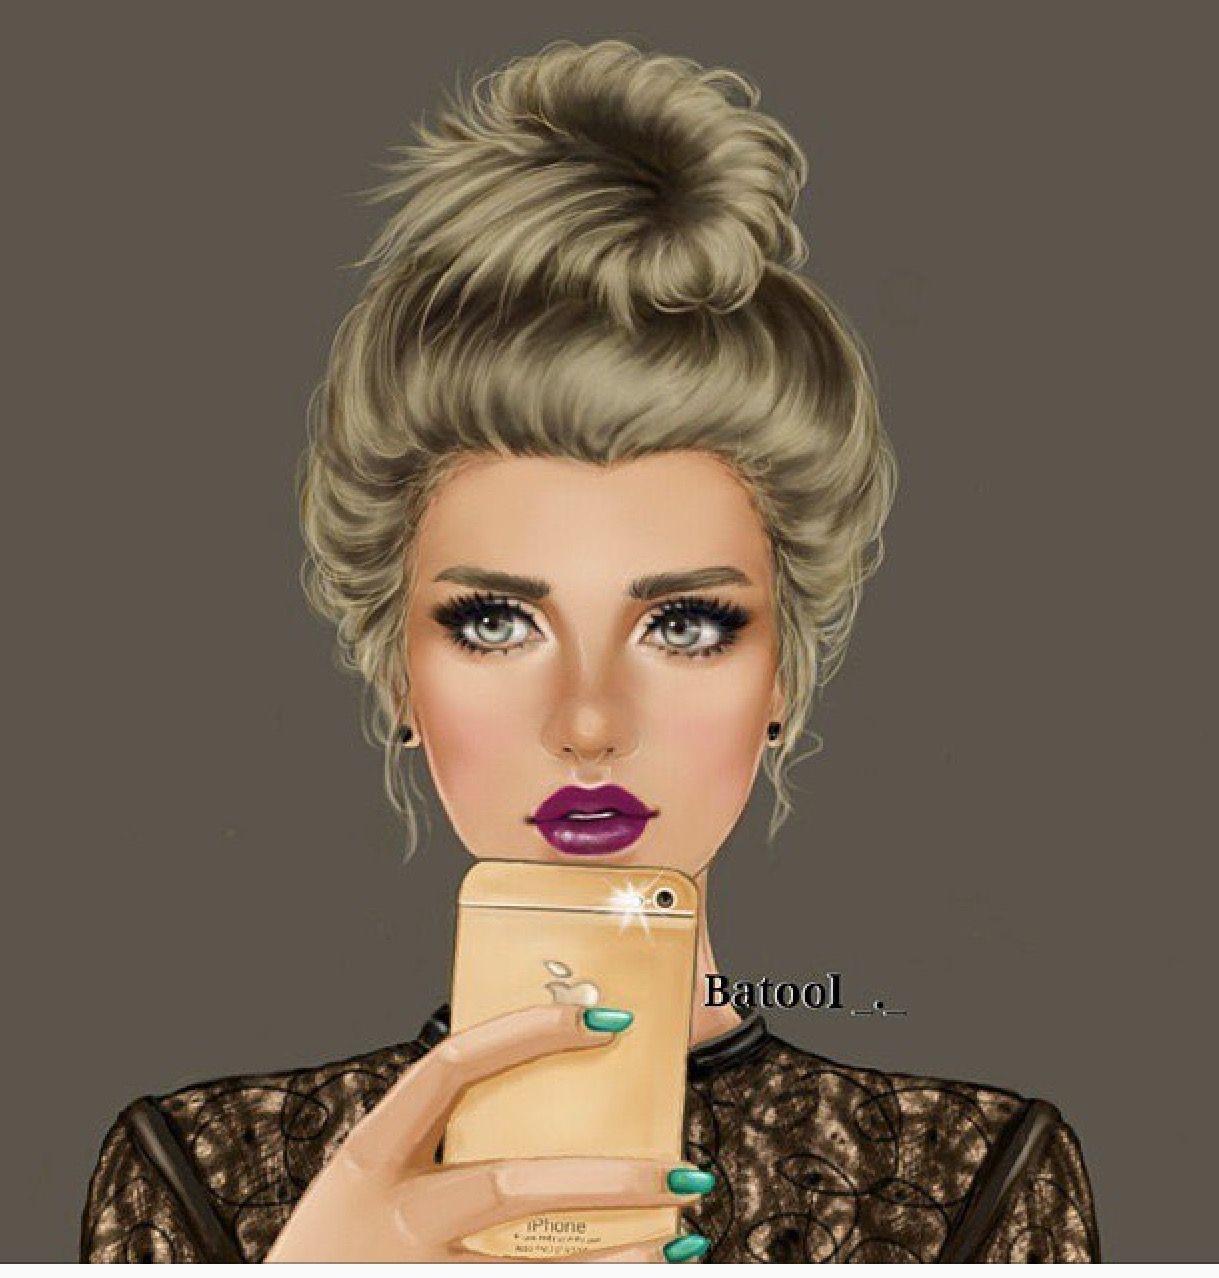 Pin By Sania Khan On Girly M..